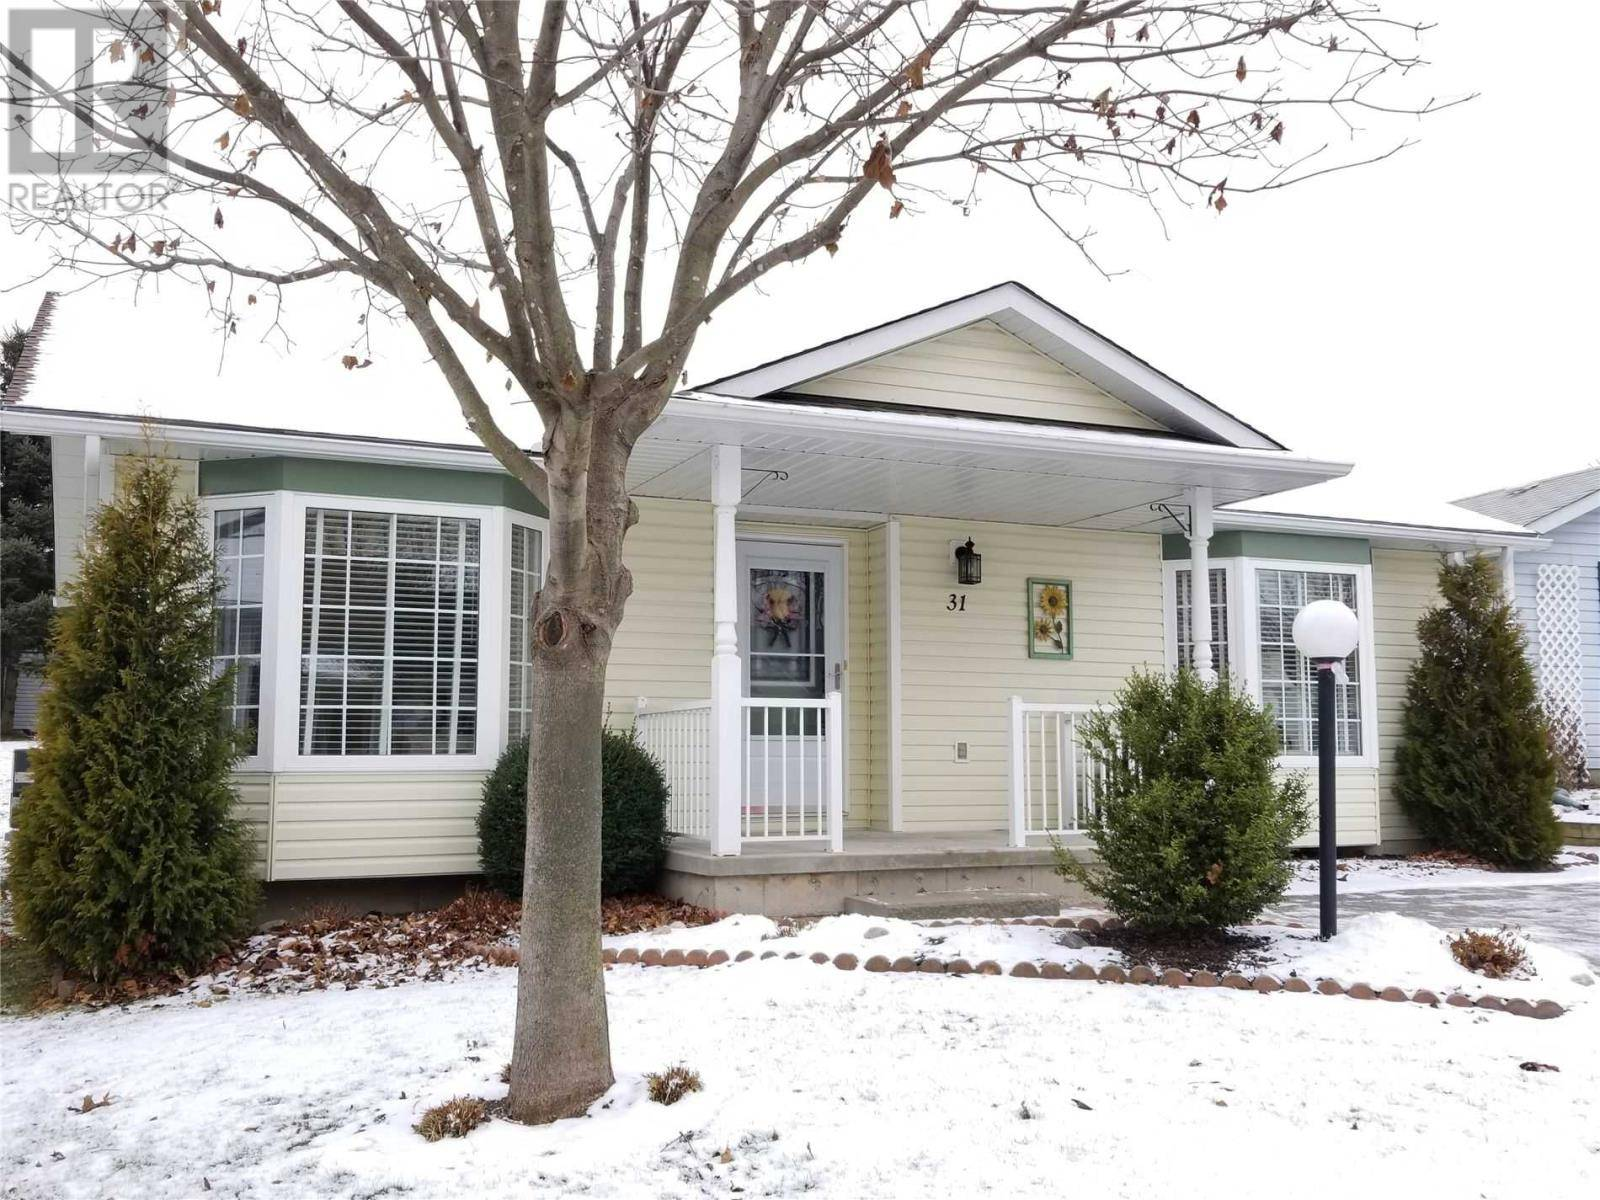 House for sale at 31 Littlebrook Rd Clarington Ontario - MLS: E4656594